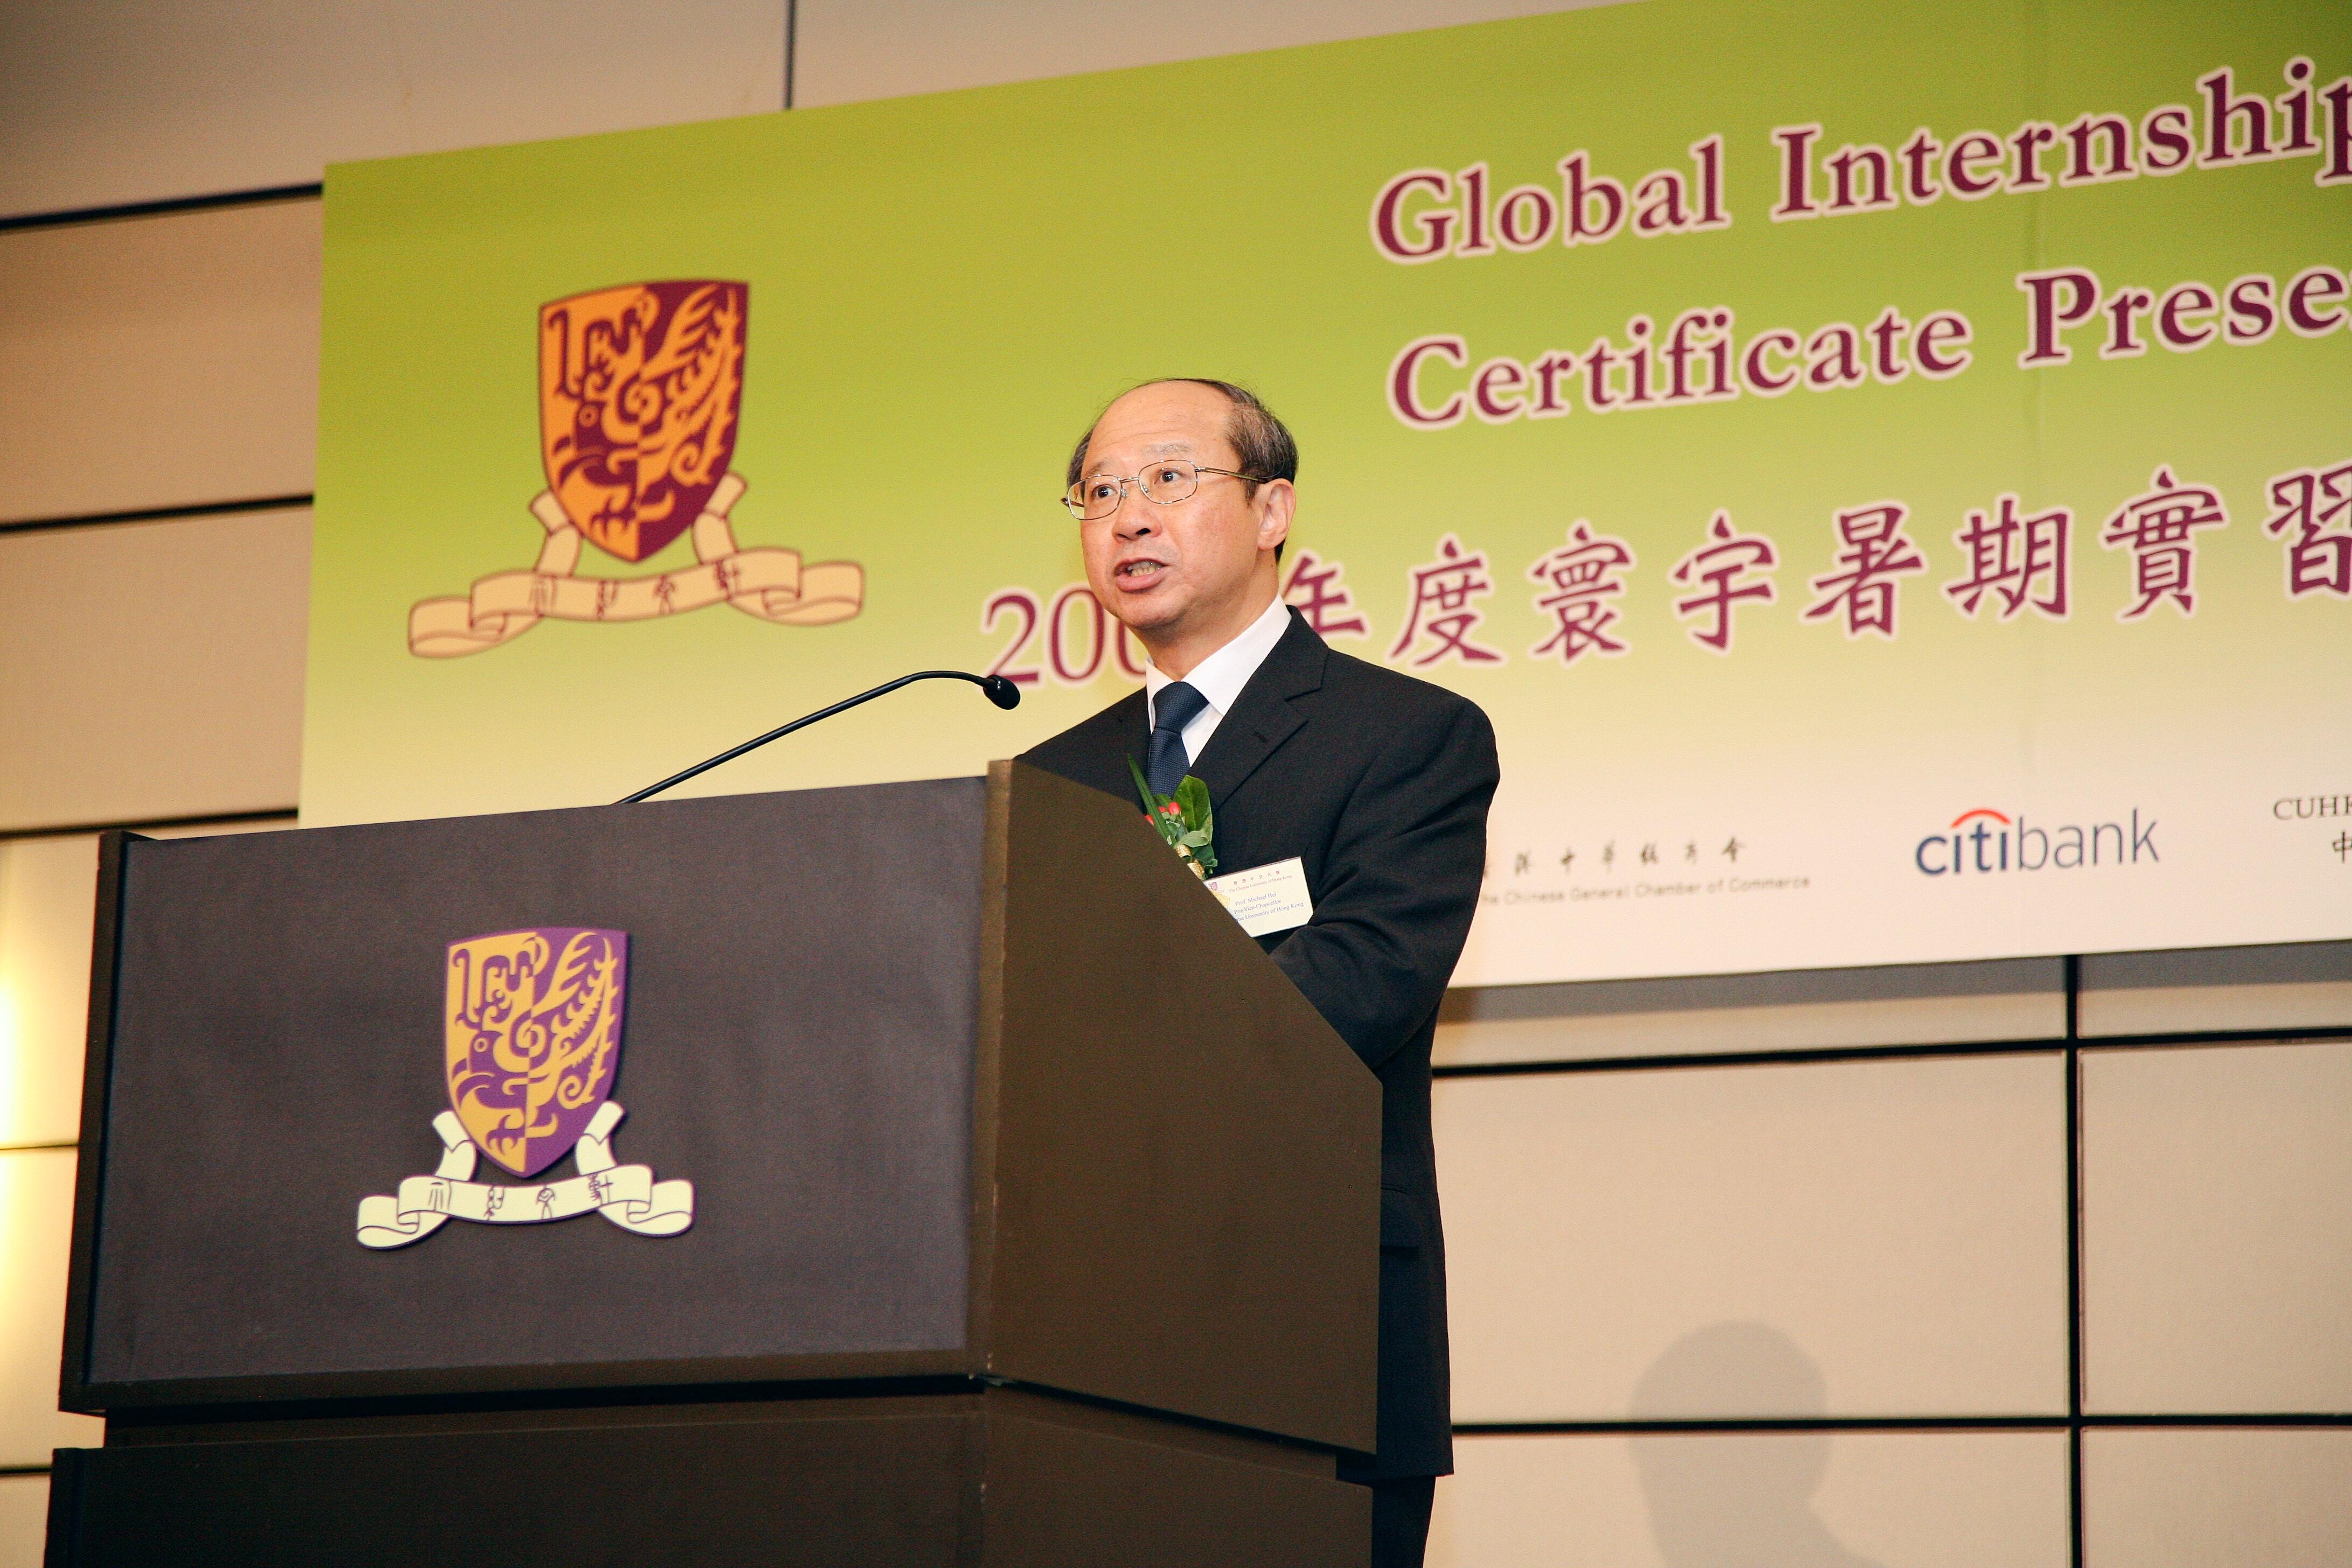 Professor Michael Hui, Pro-Vice-Chancellor of CUHK